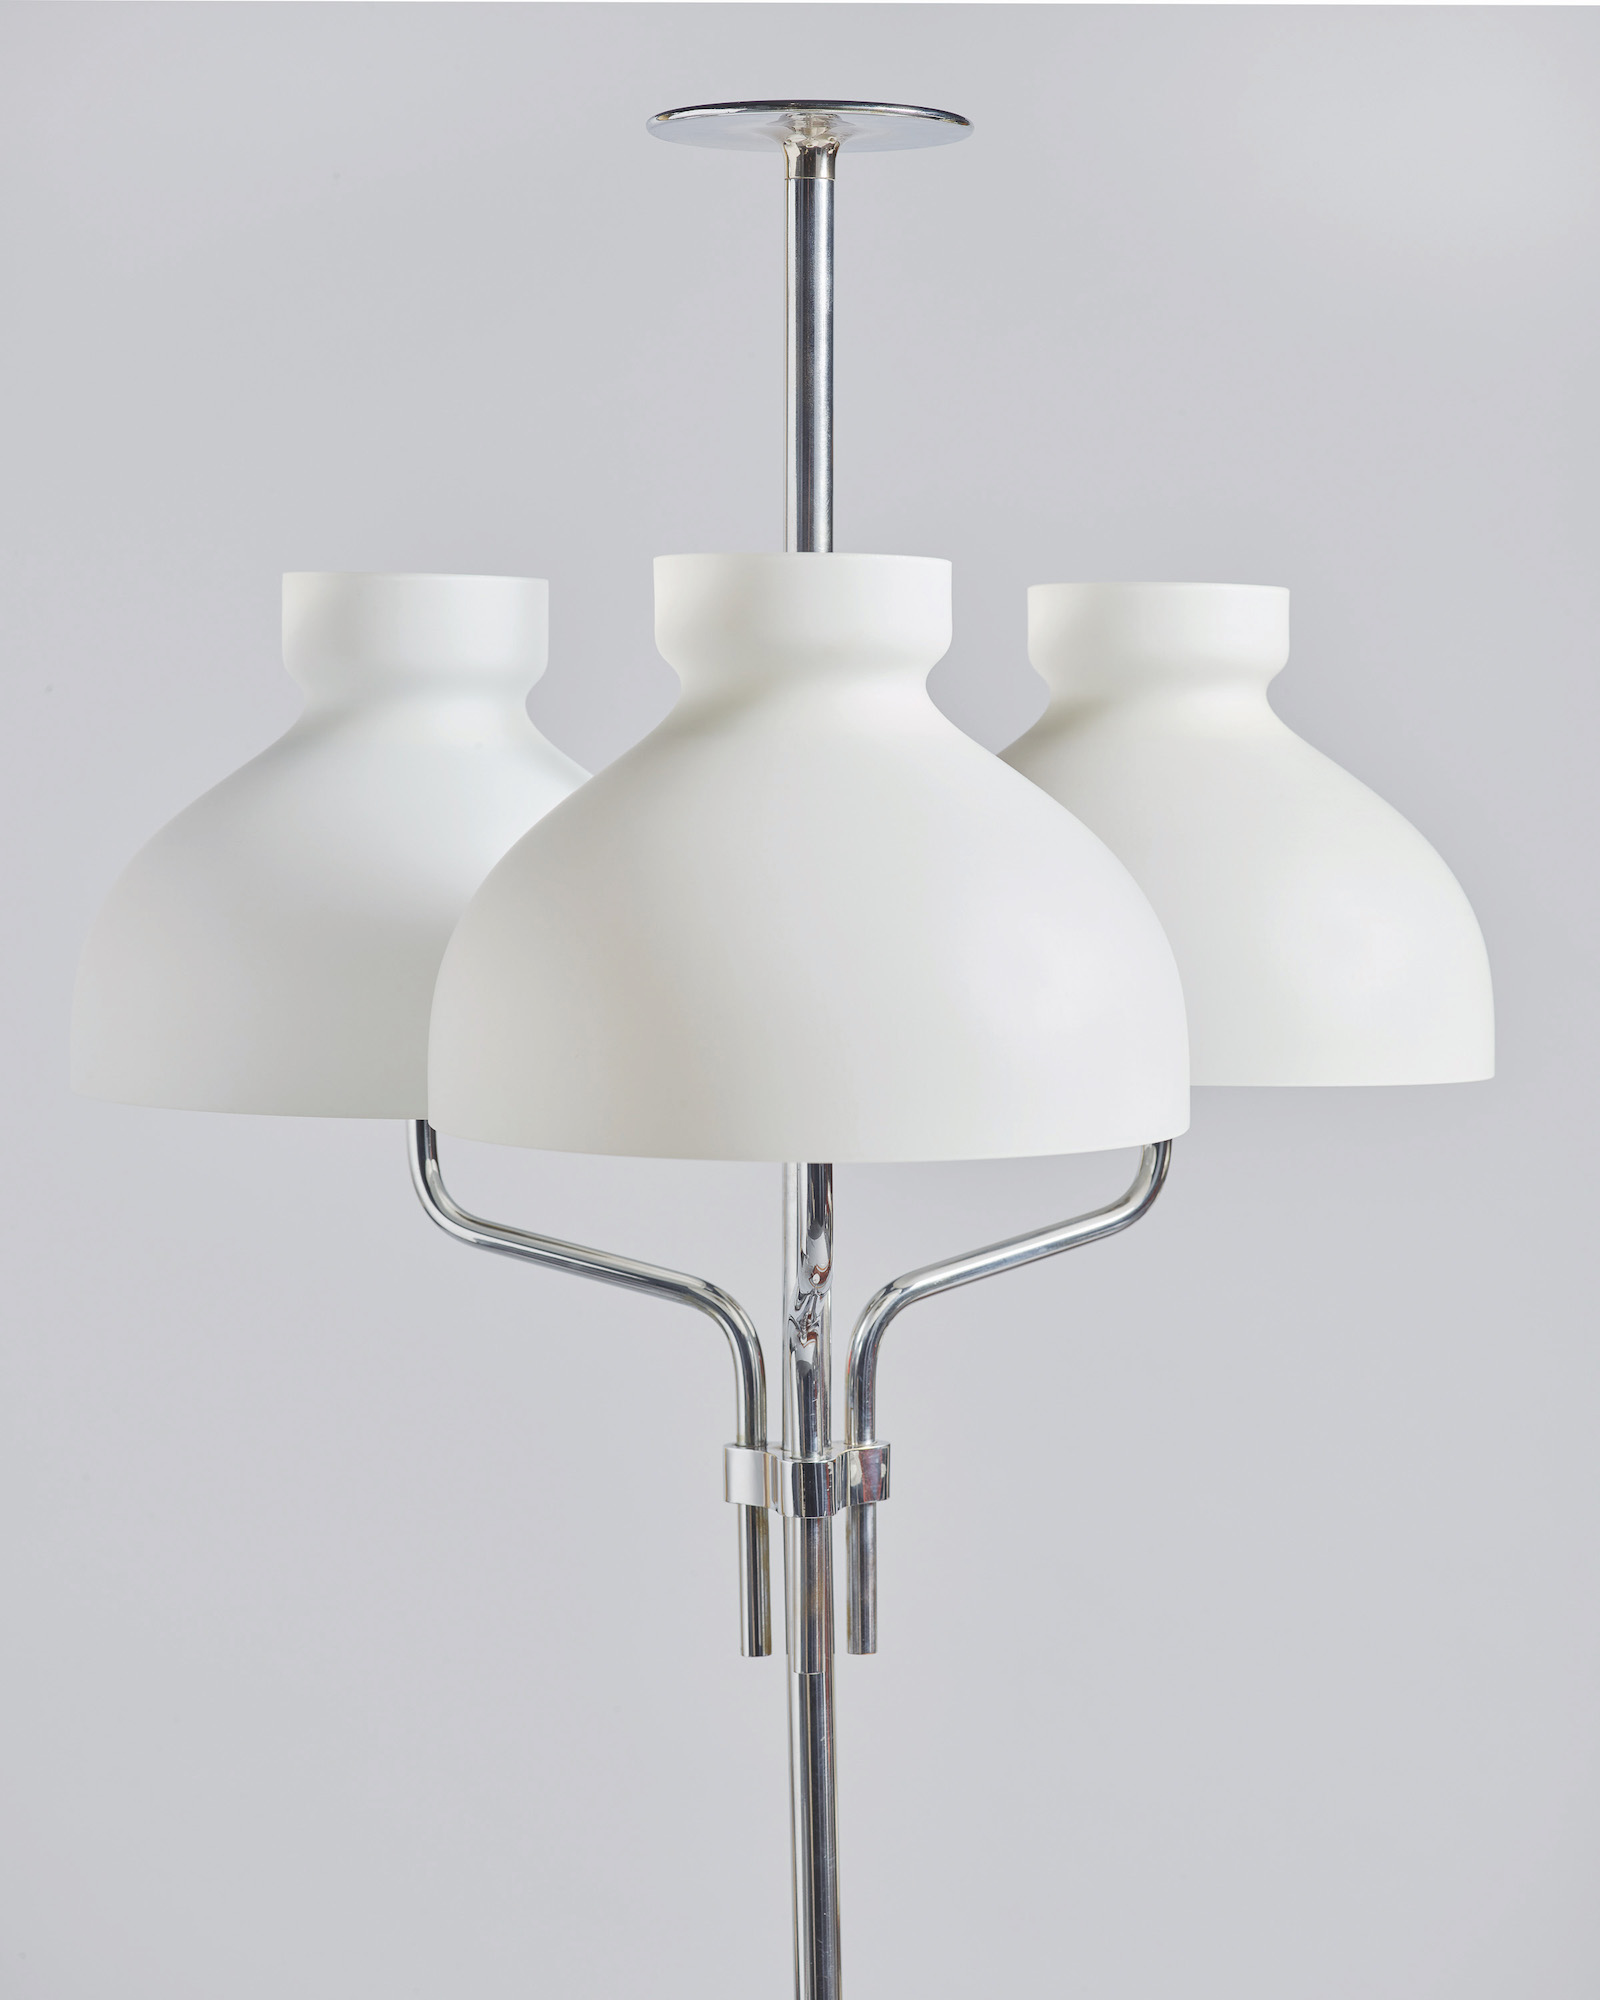 NOMAD St.Moritz_Galleria Rossella Colombari Milano_Arenzano Table Lamp_Ignazio Gardella_ph.Federico Torra.jpg